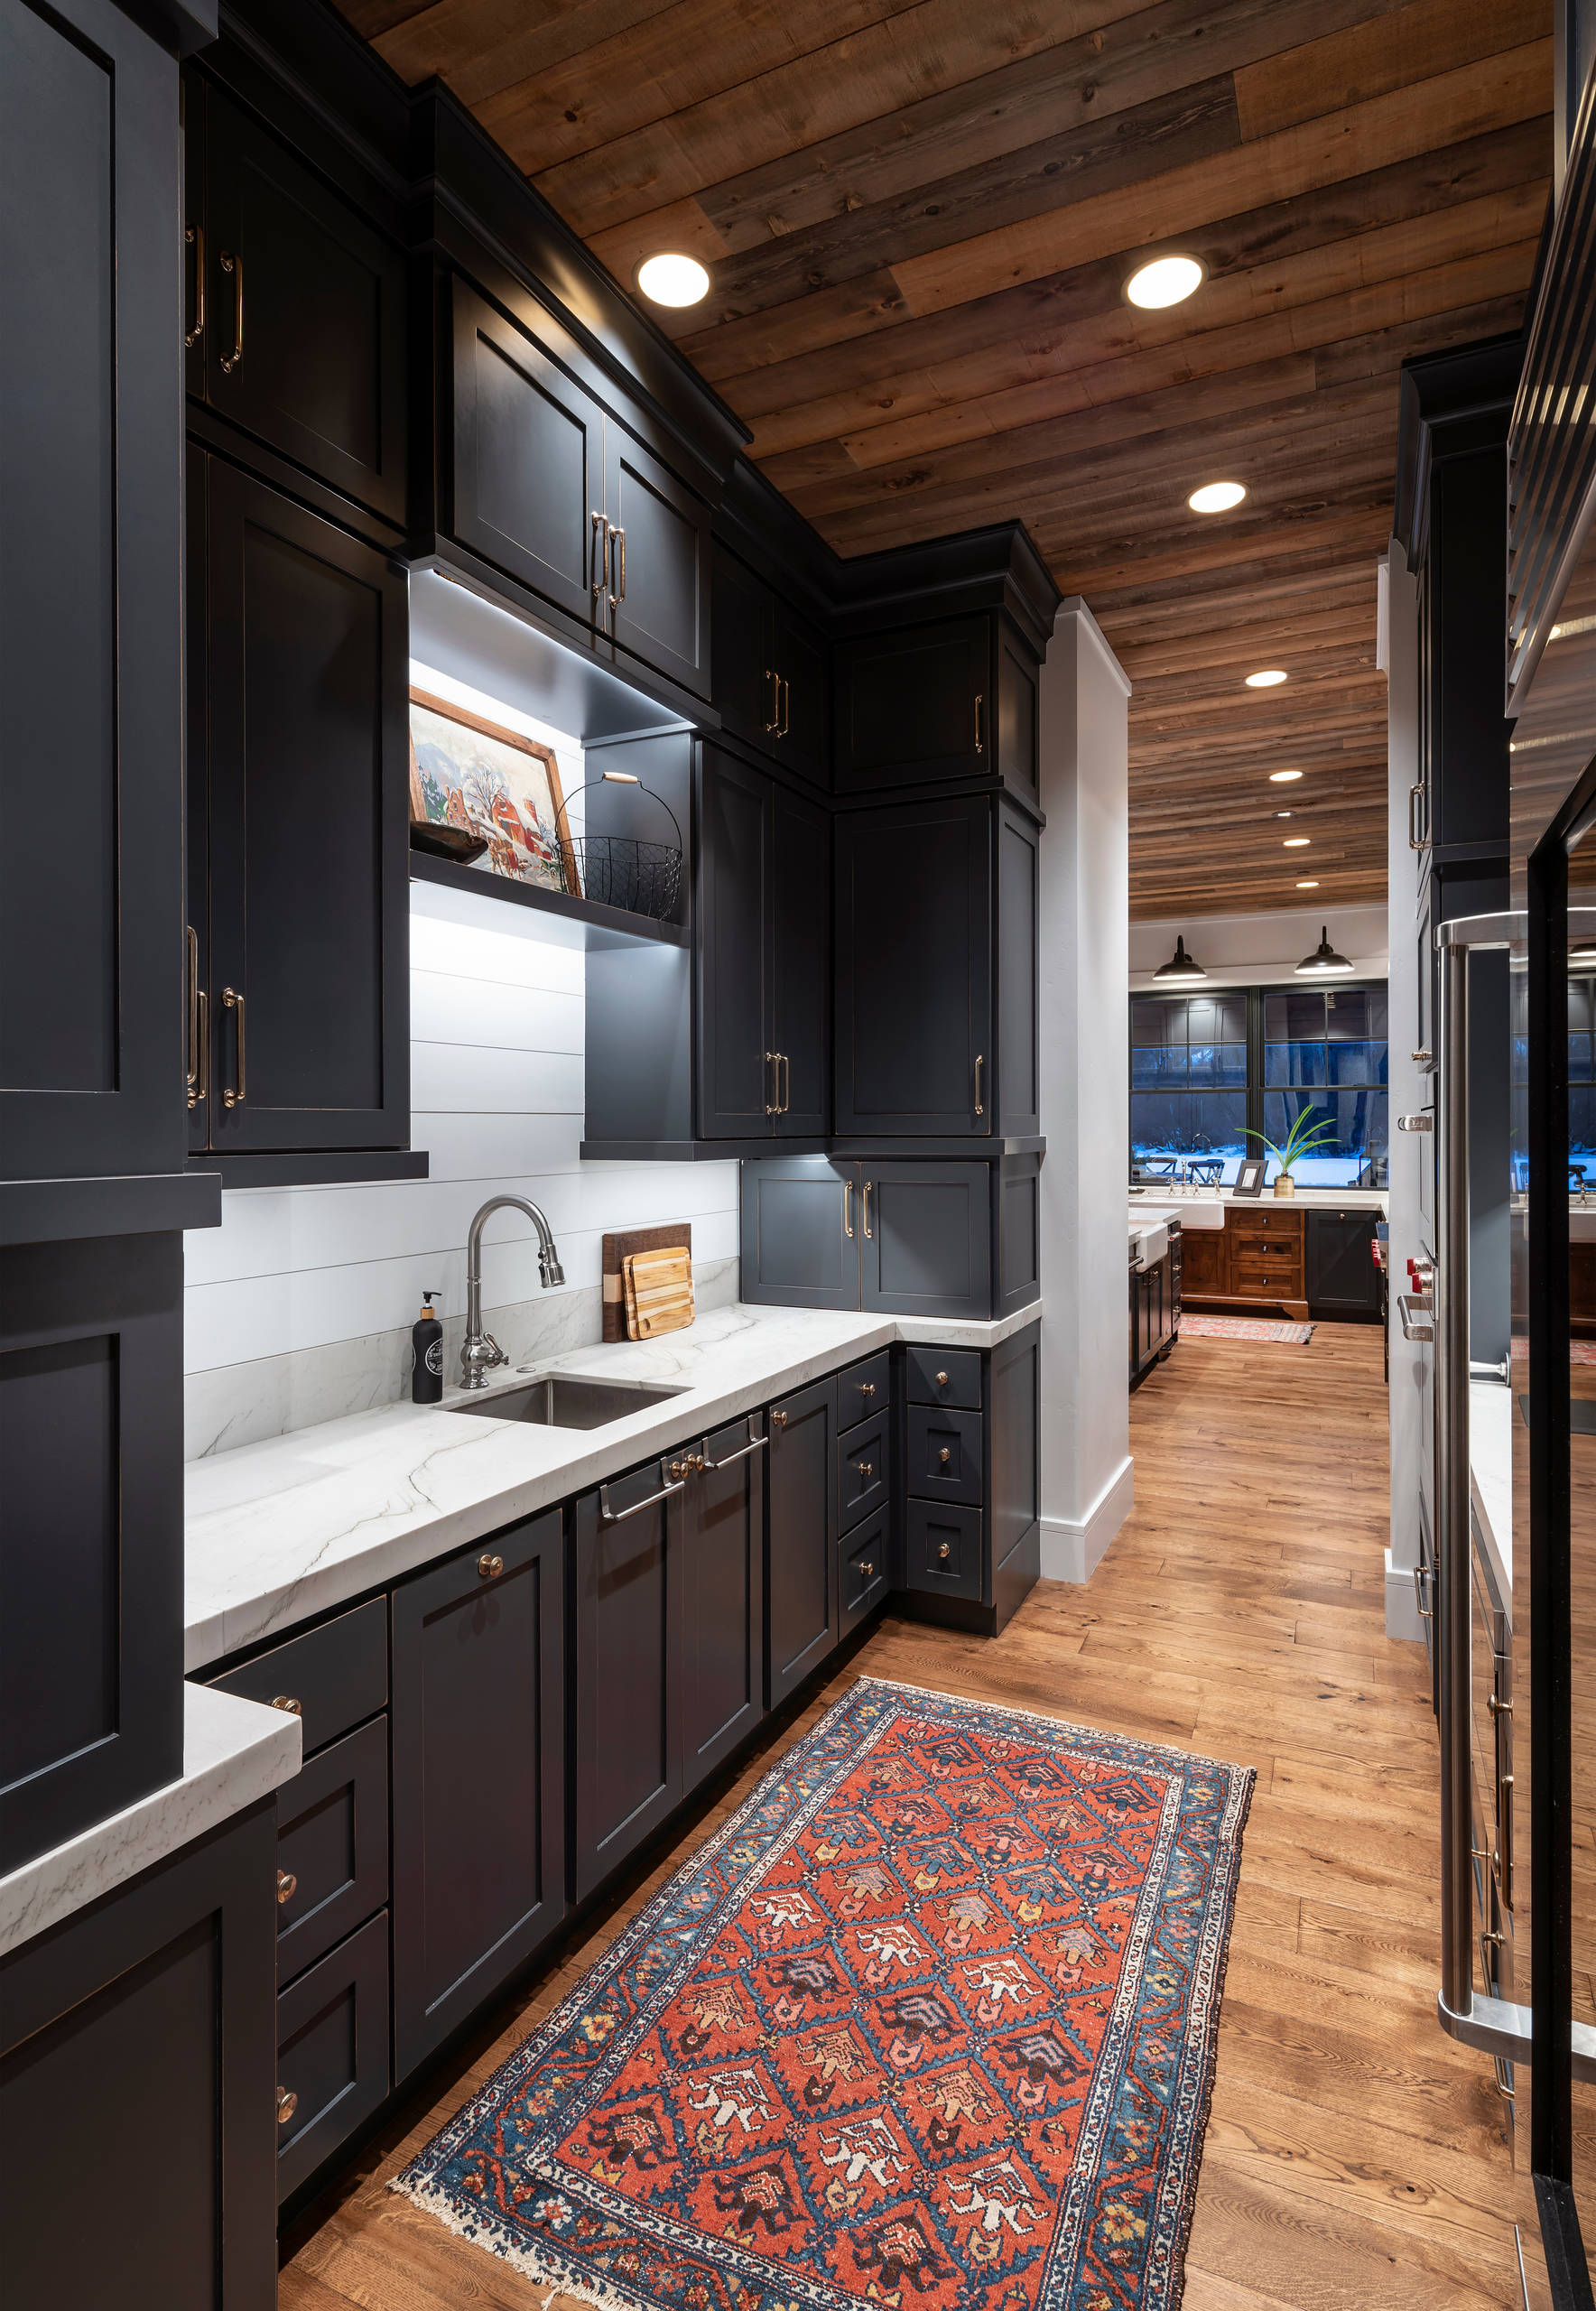 75 Beautiful Kitchen With Shiplap Backsplash Pictures Ideas January 2021 Houzz